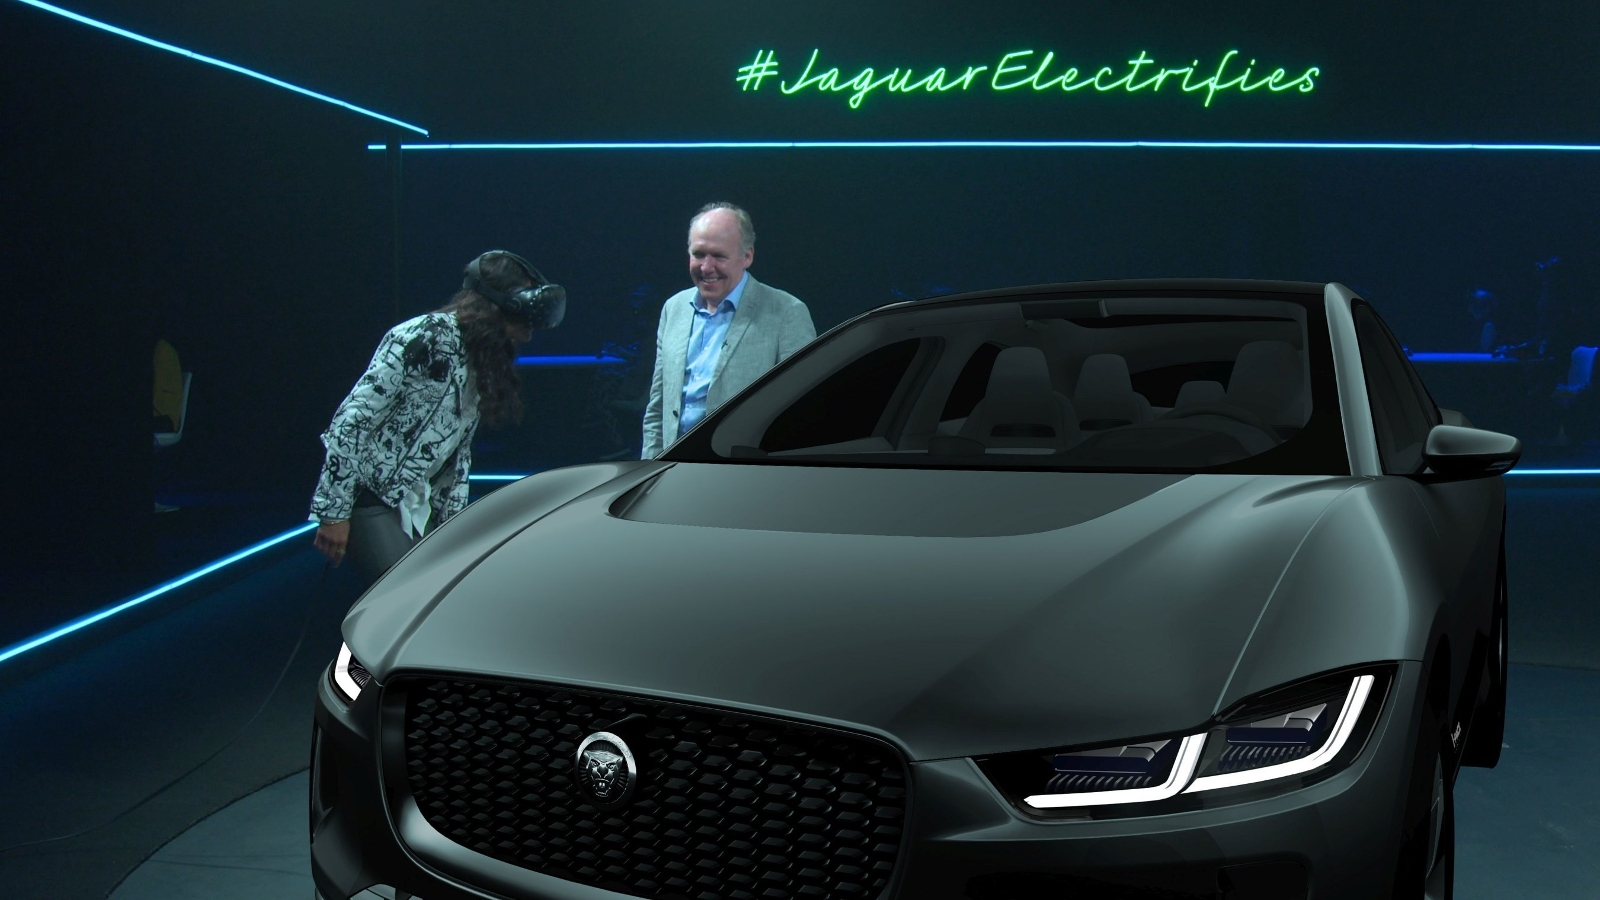 Jaguar F Pace Exterior >> Inside the Jaguar I-Pace electric crossover VR press event